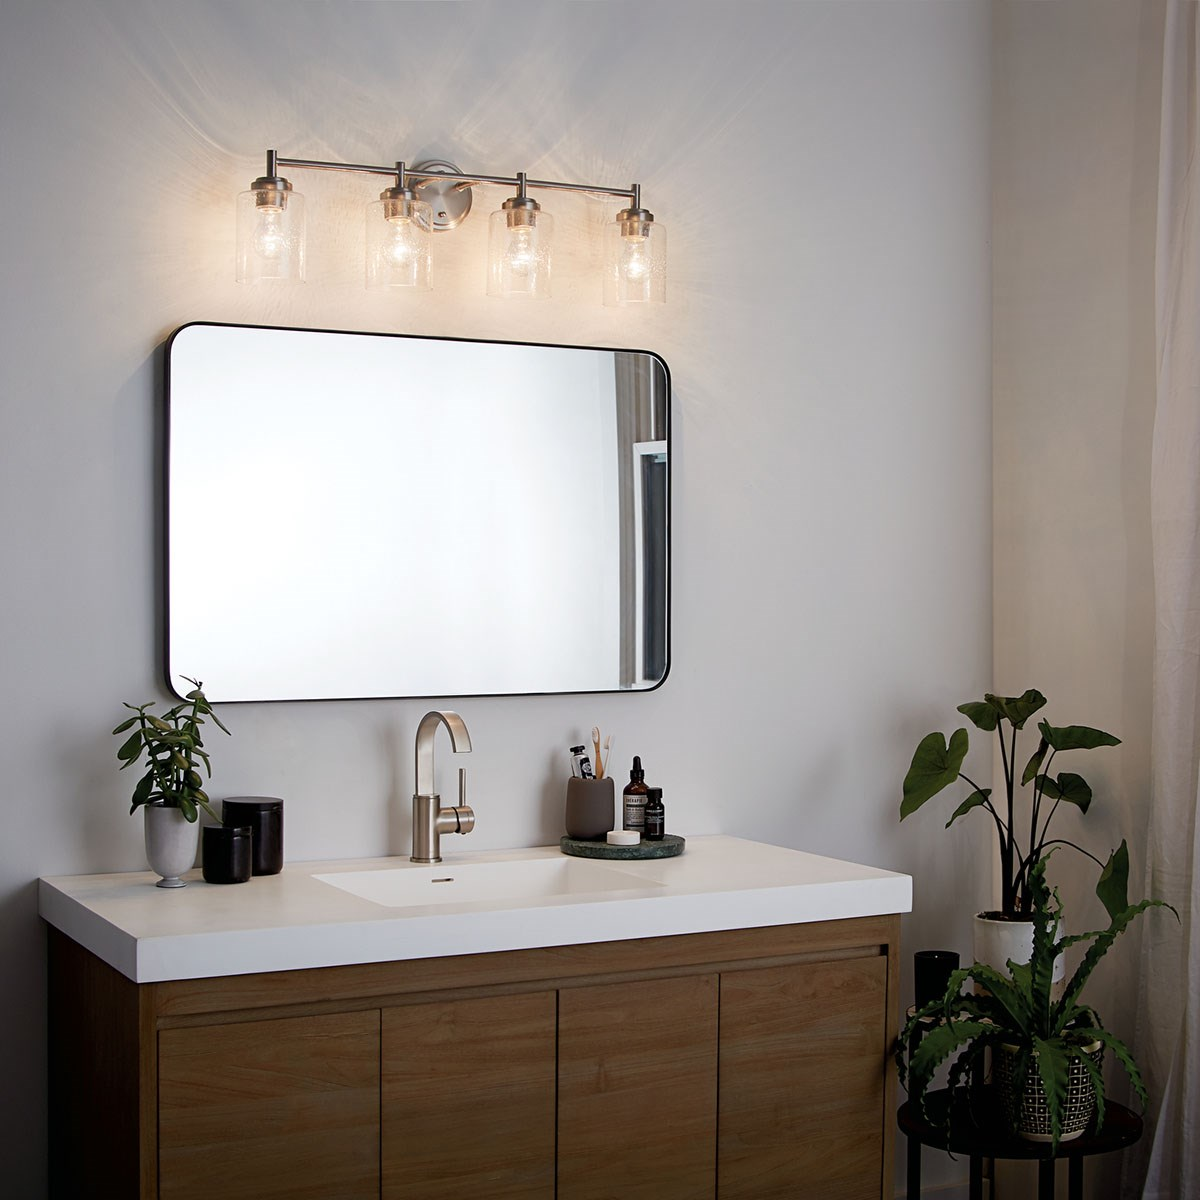 Winslow 4 Light Vanity Light Brushed Nickel Kichler Lighting